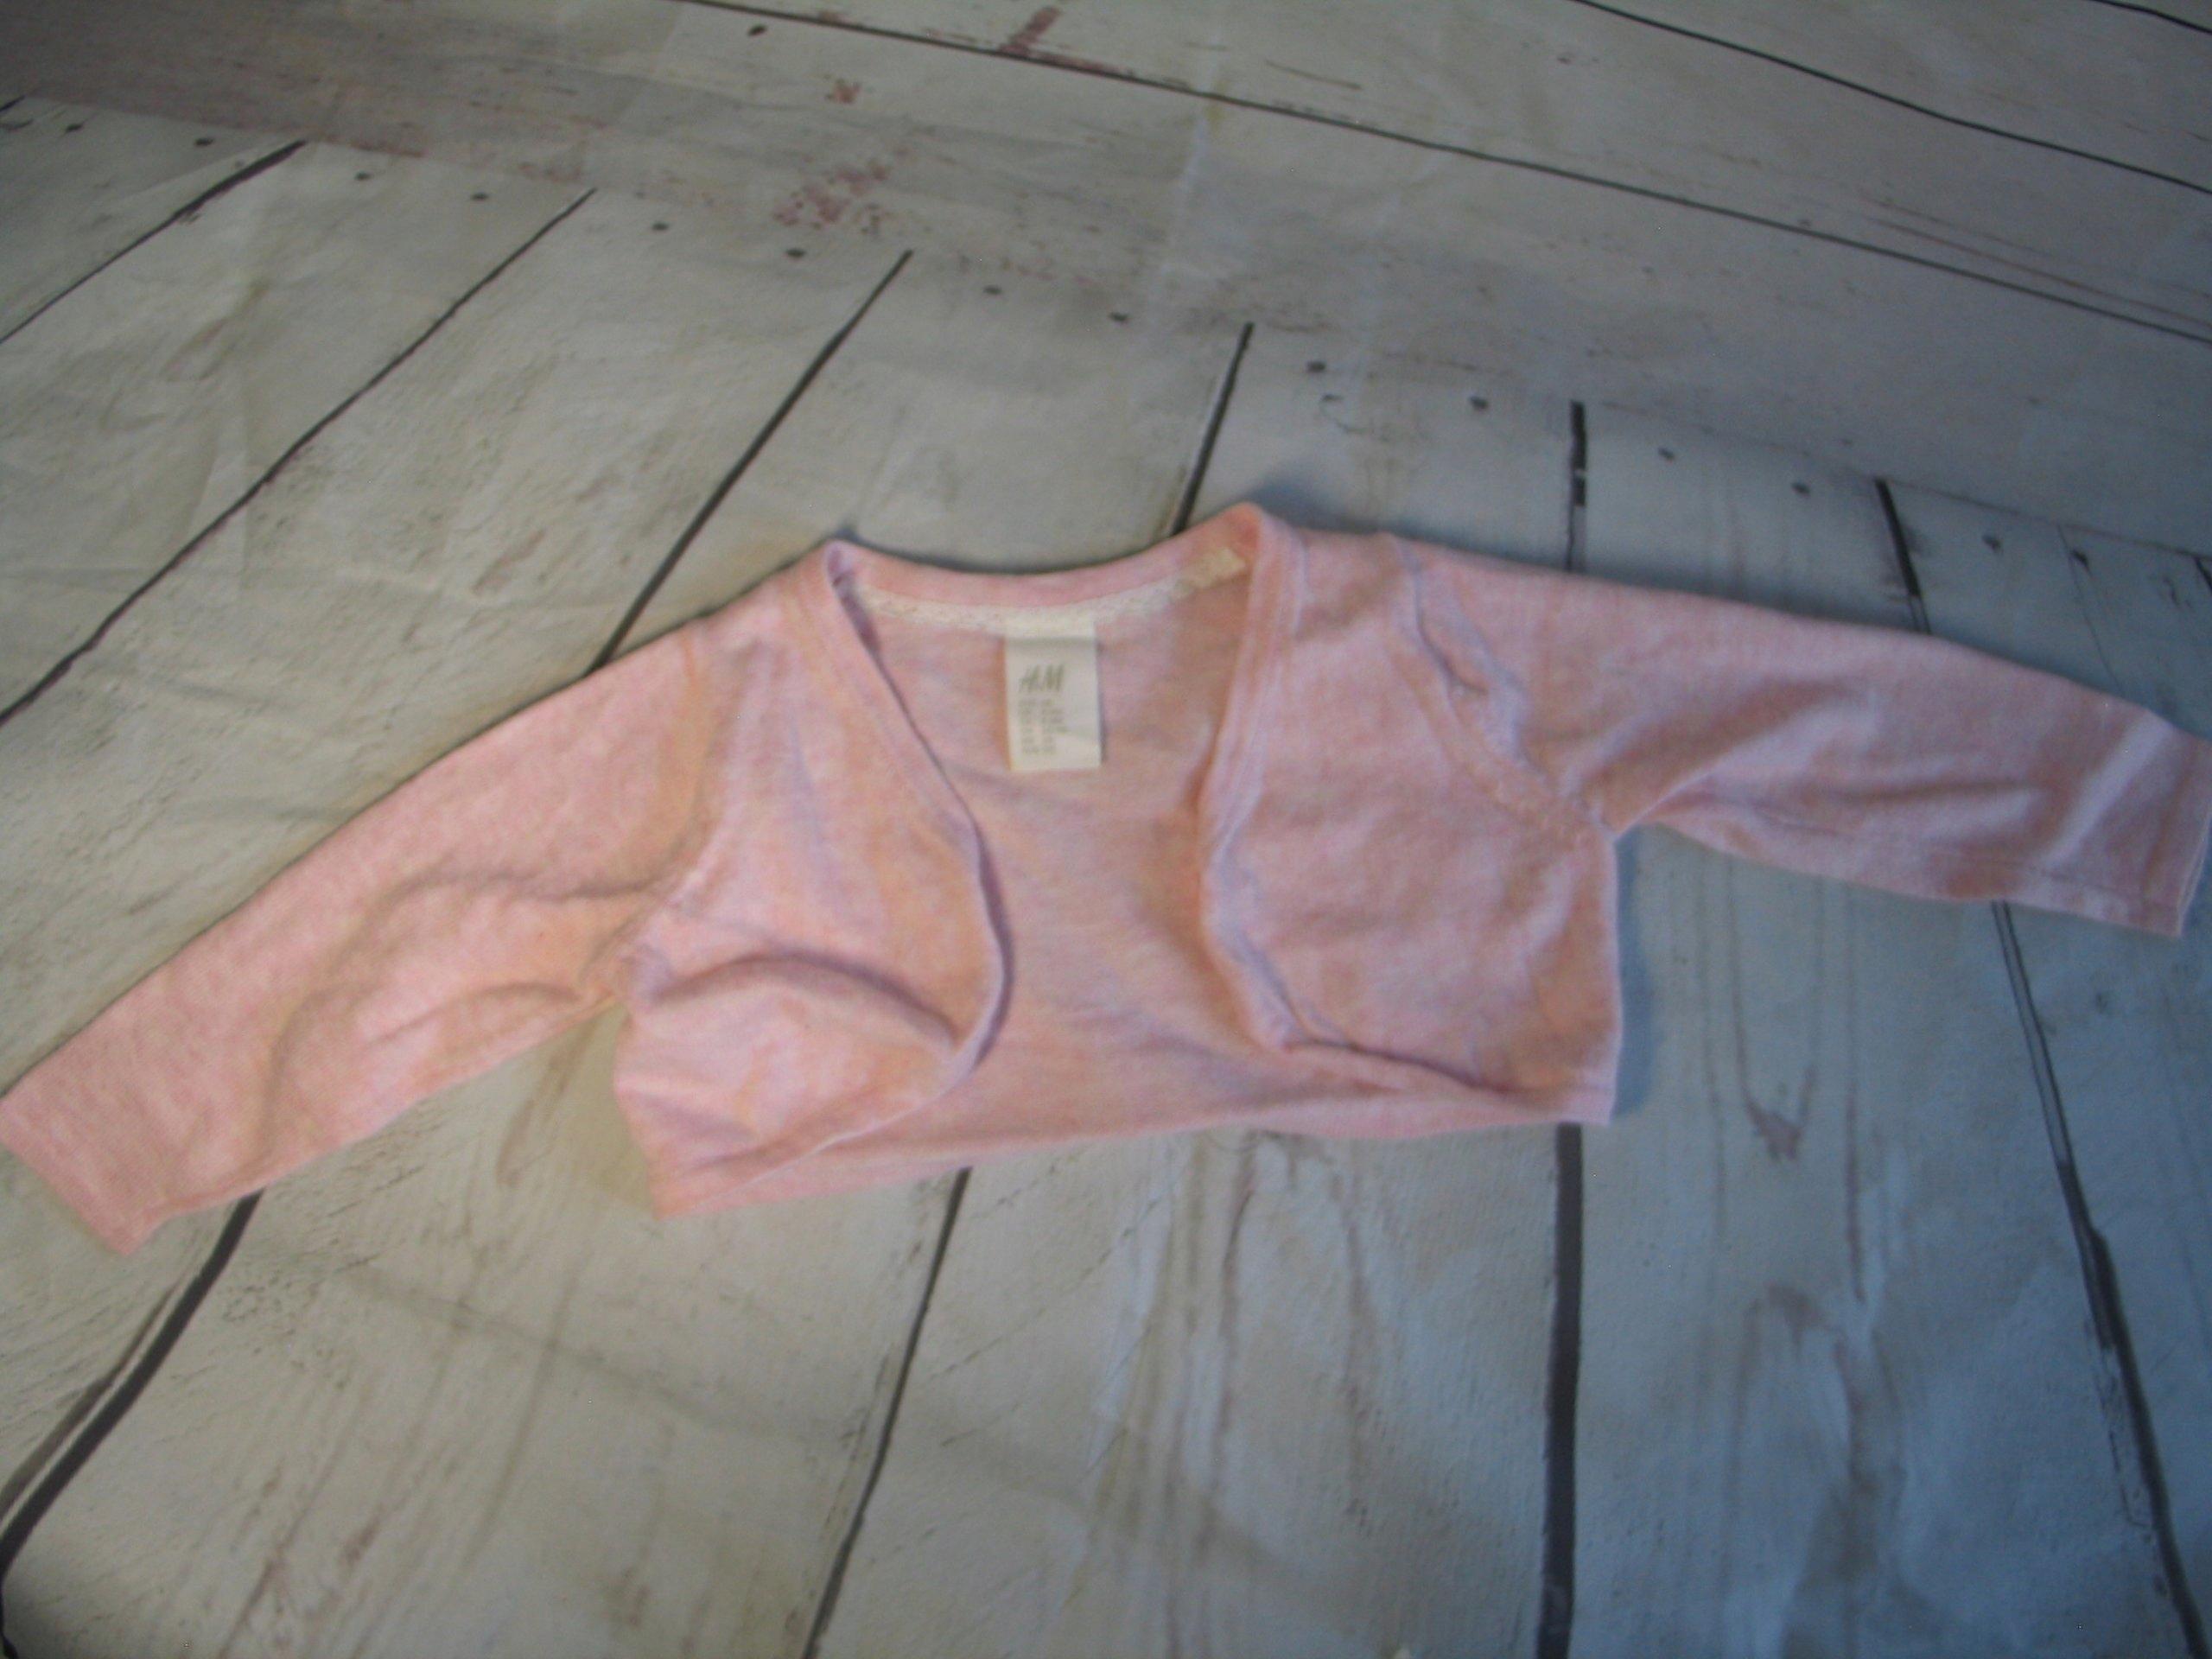 sweterek bolerko narzutka H&M 4-6 m, r. 68